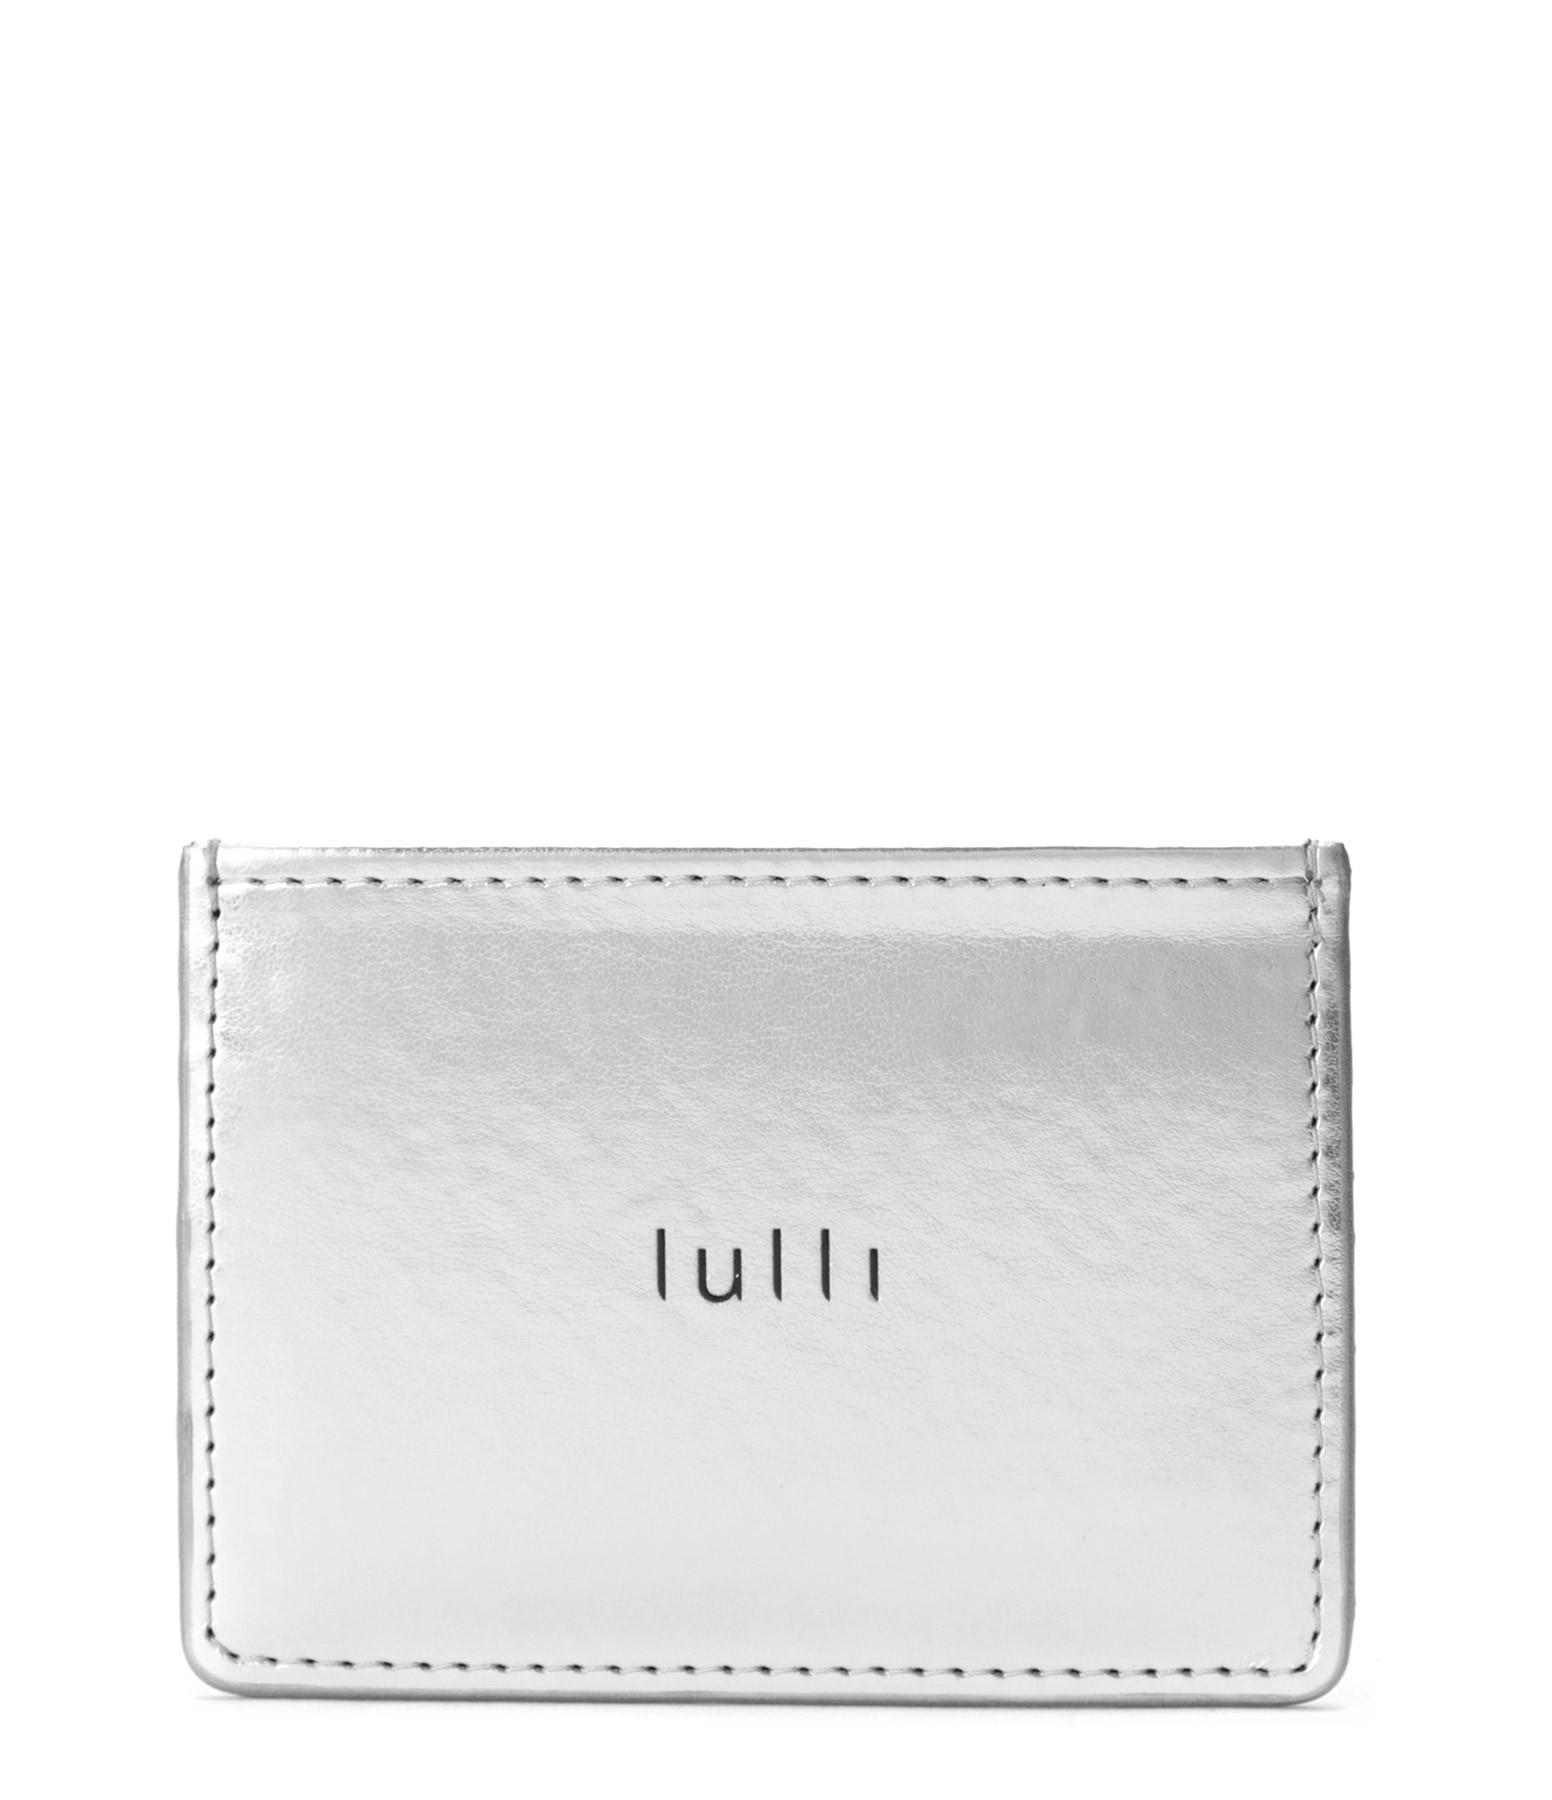 LULLI - Porte-cartes Lulli Cuir Argenté